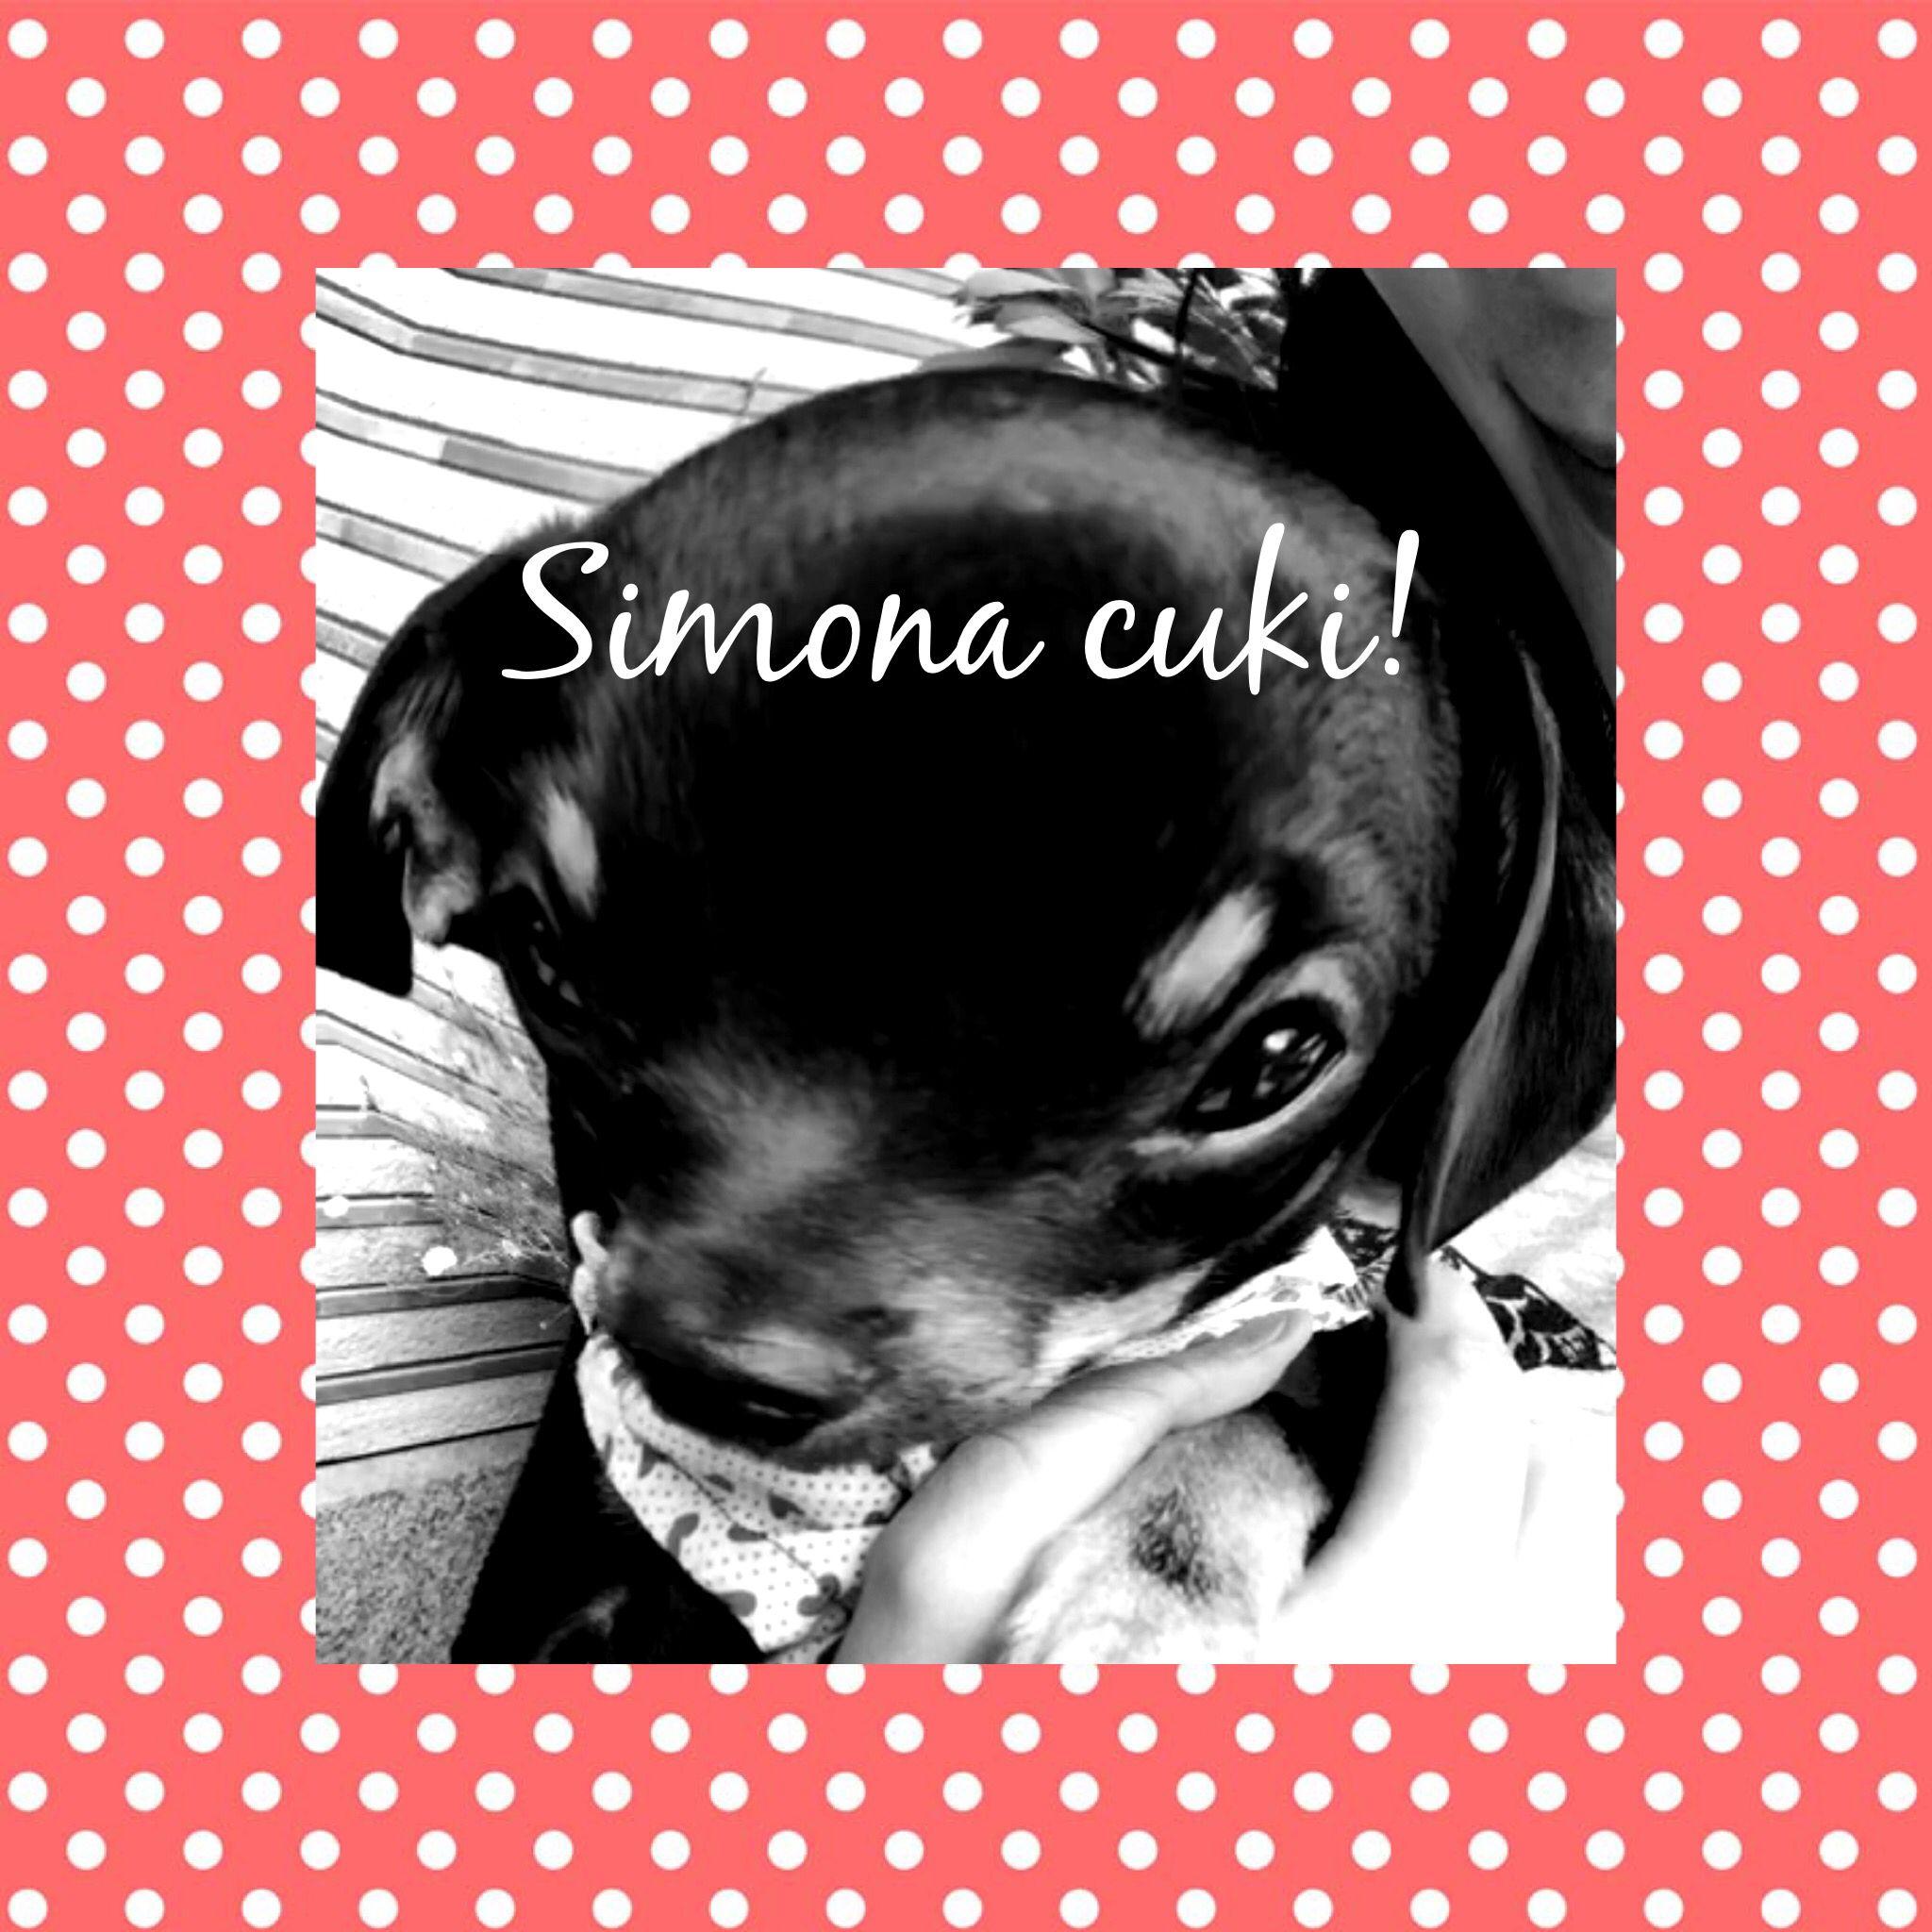 Uncategorized Simona Suh cukii y simon simona pinterest